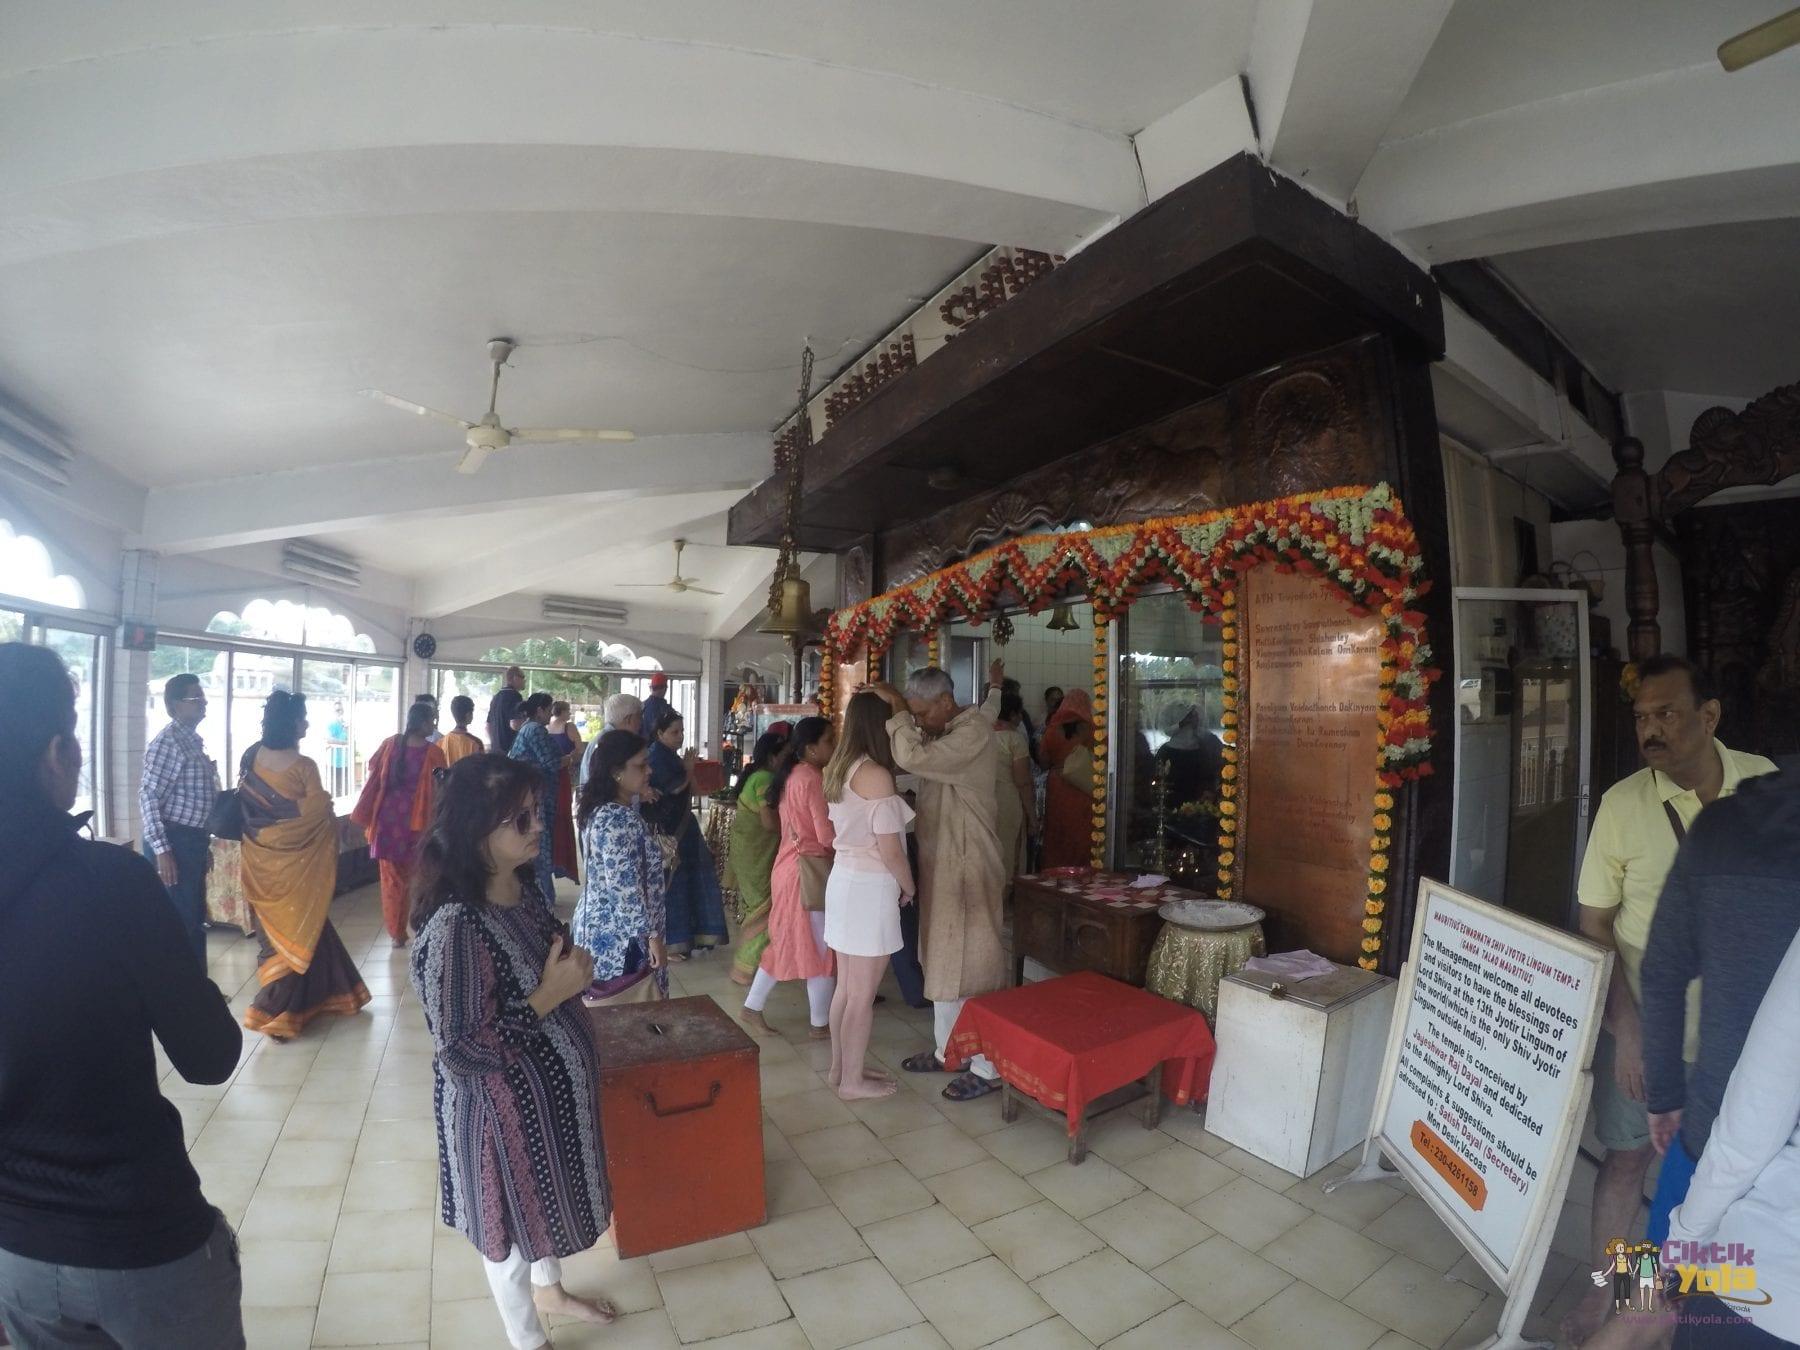 grand bassin ganesha mauritius tapınak hindu